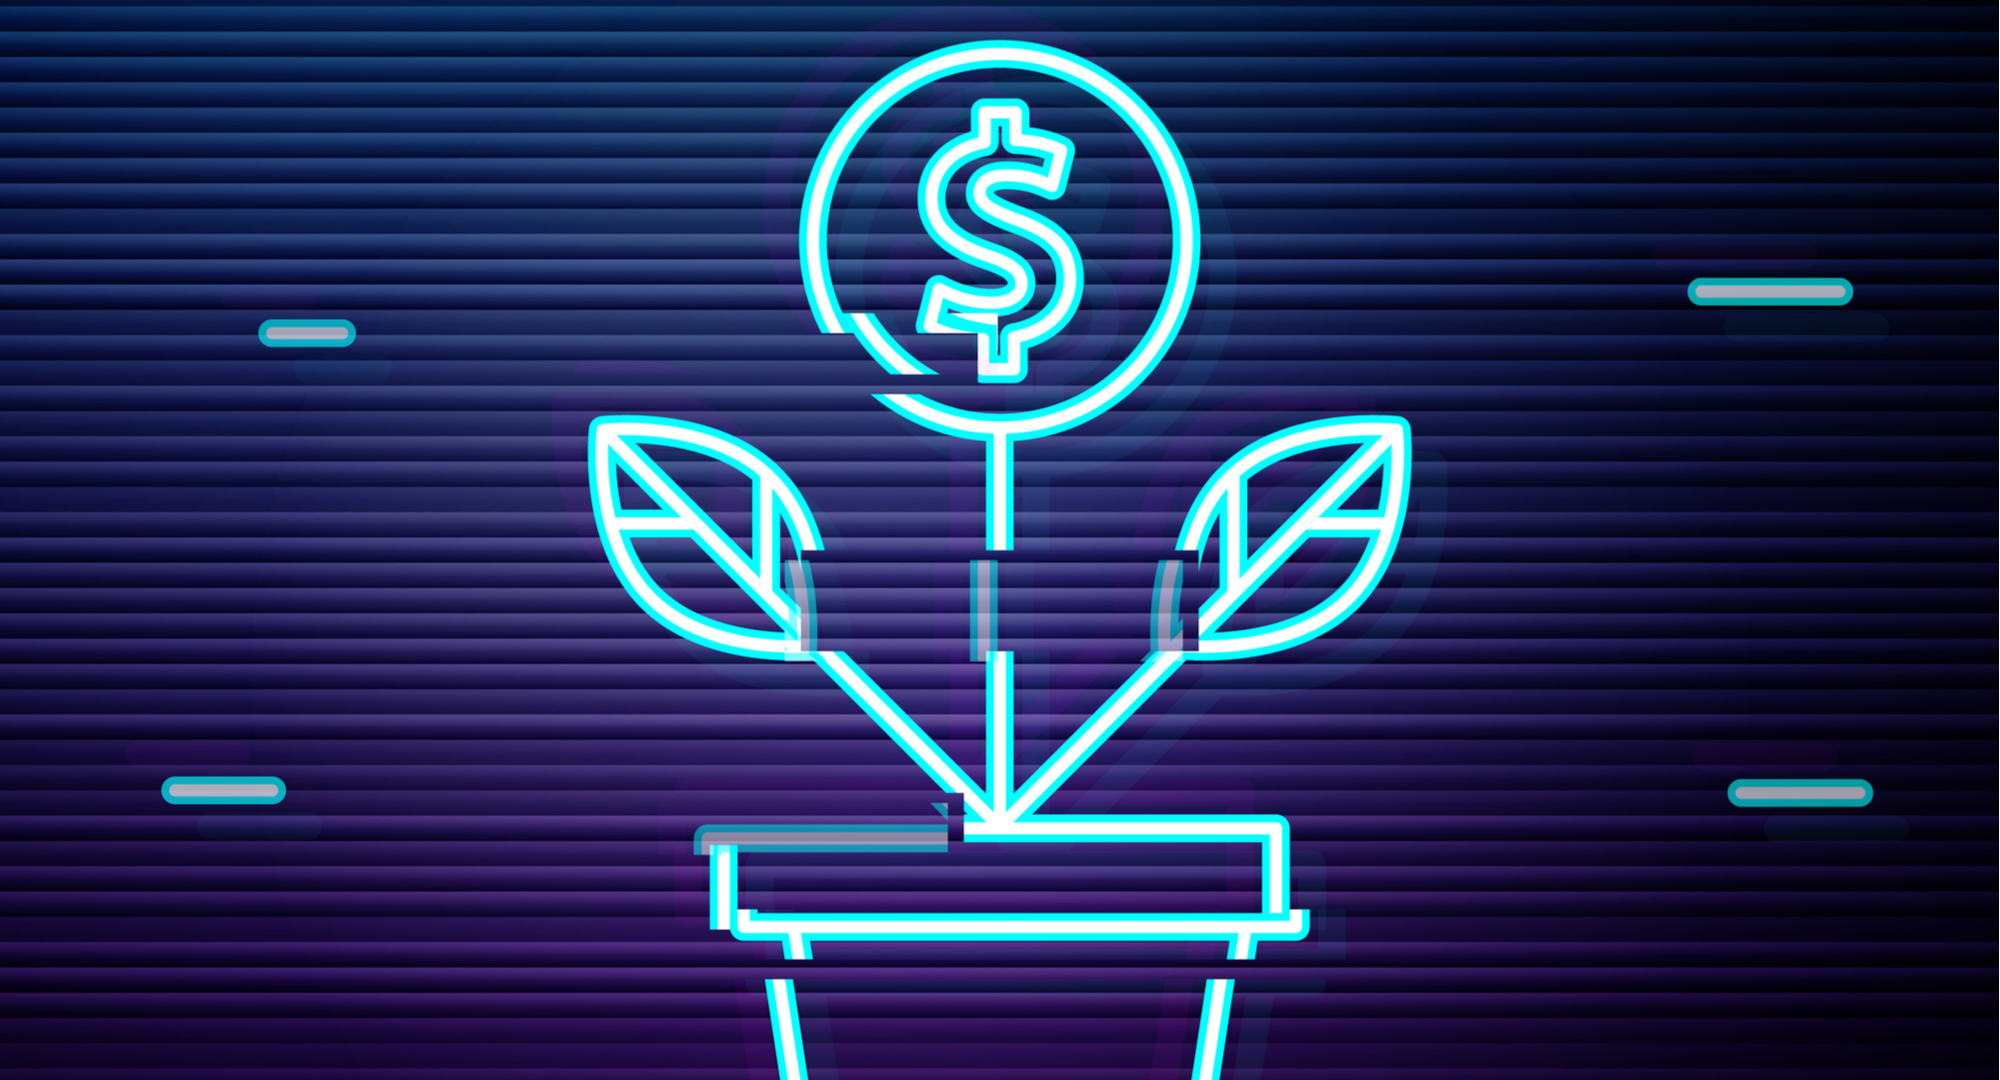 UK cyber startup funding